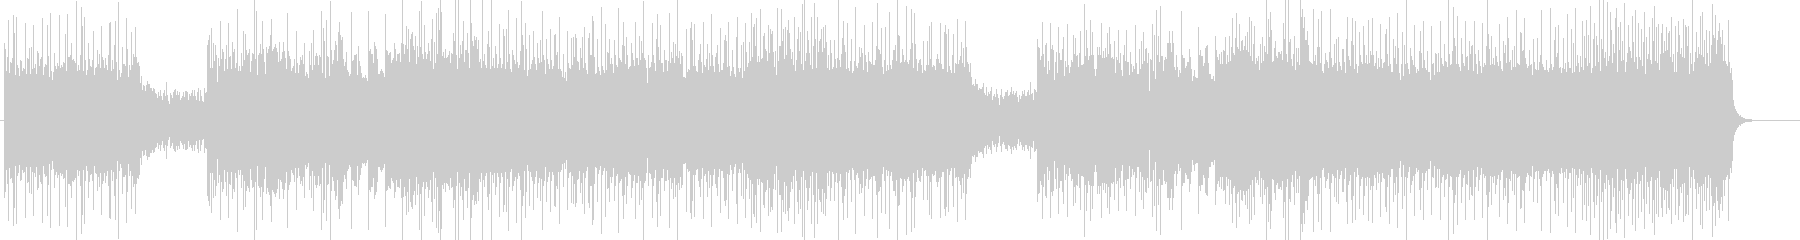 「HR/HM」「DEATH」BGM270の未再生の波形